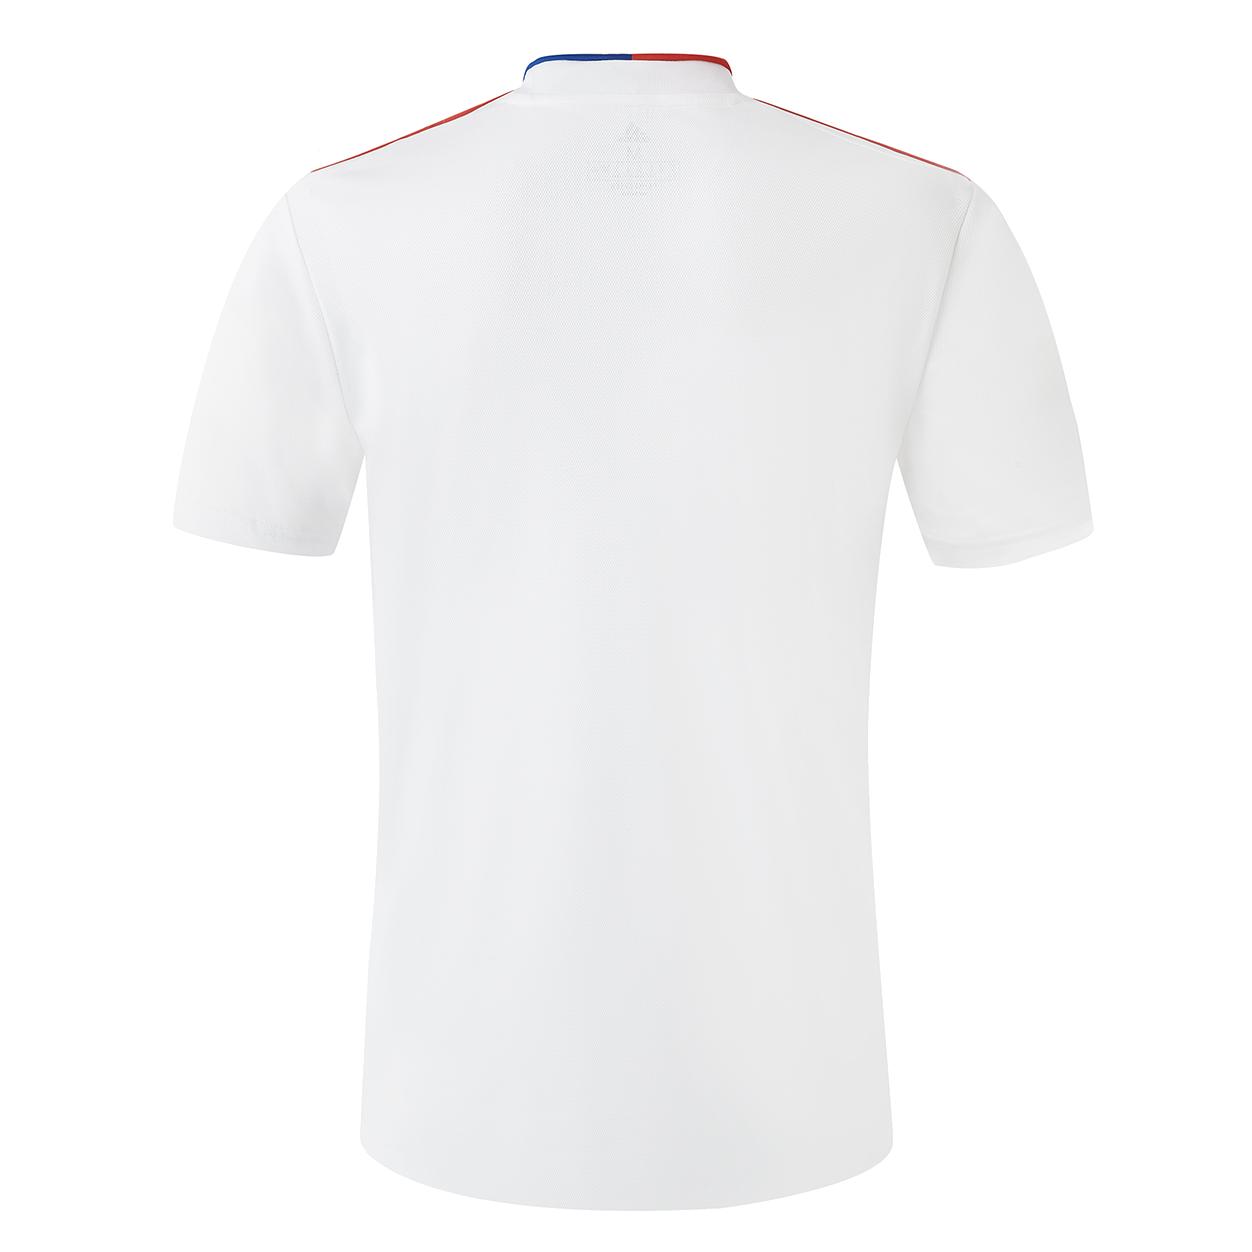 Men's home jersey 21/22 - PRE-ORDER